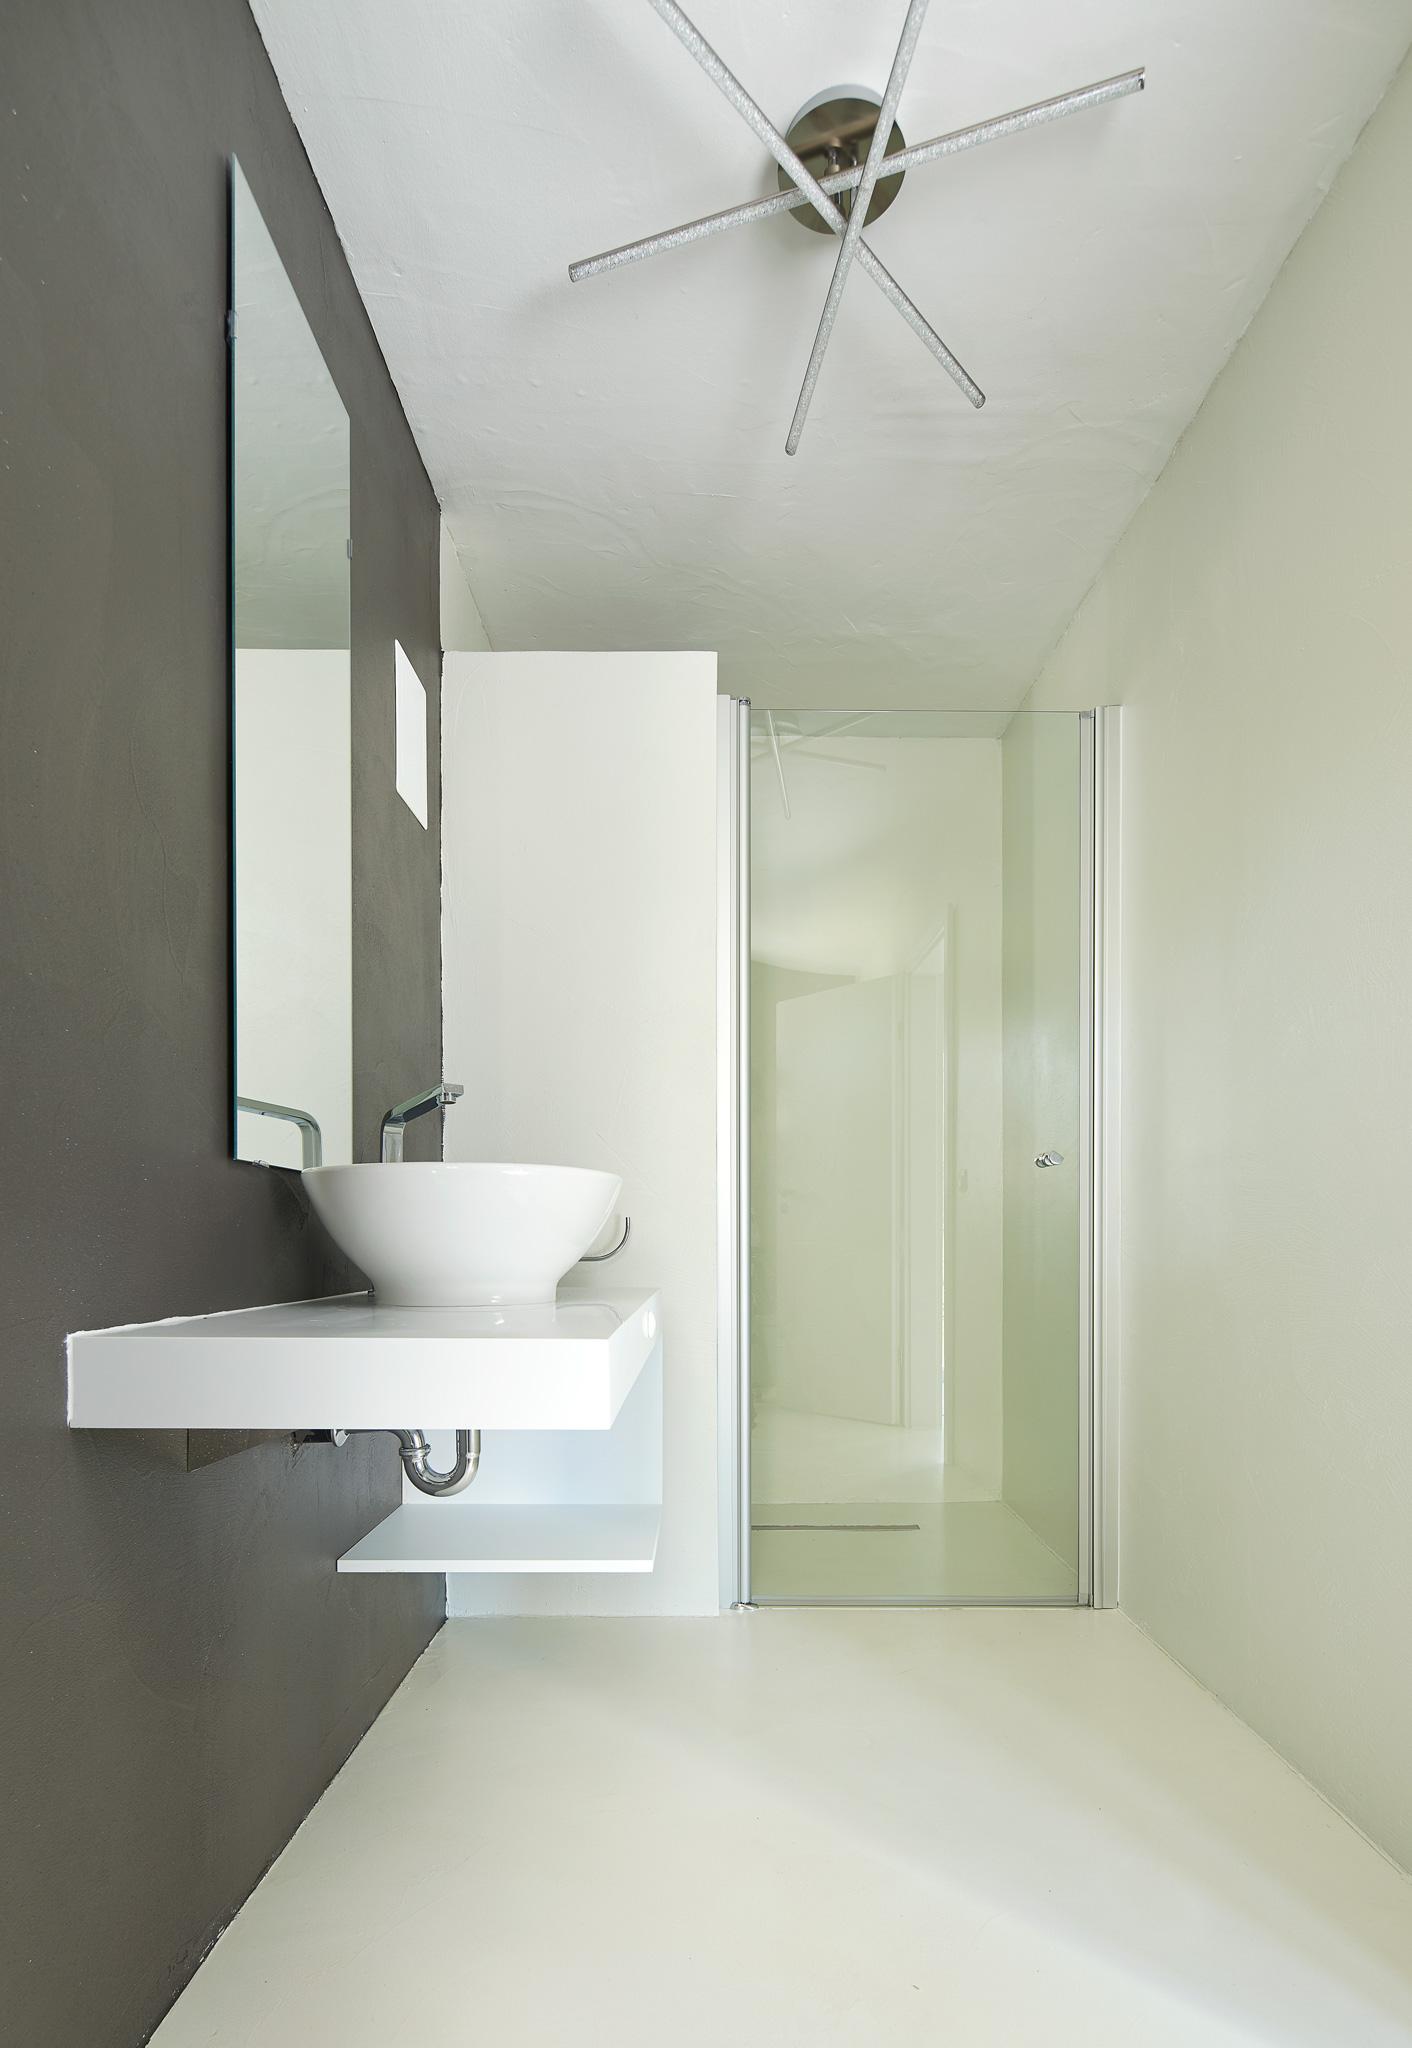 Bathroom_4.2.jpg